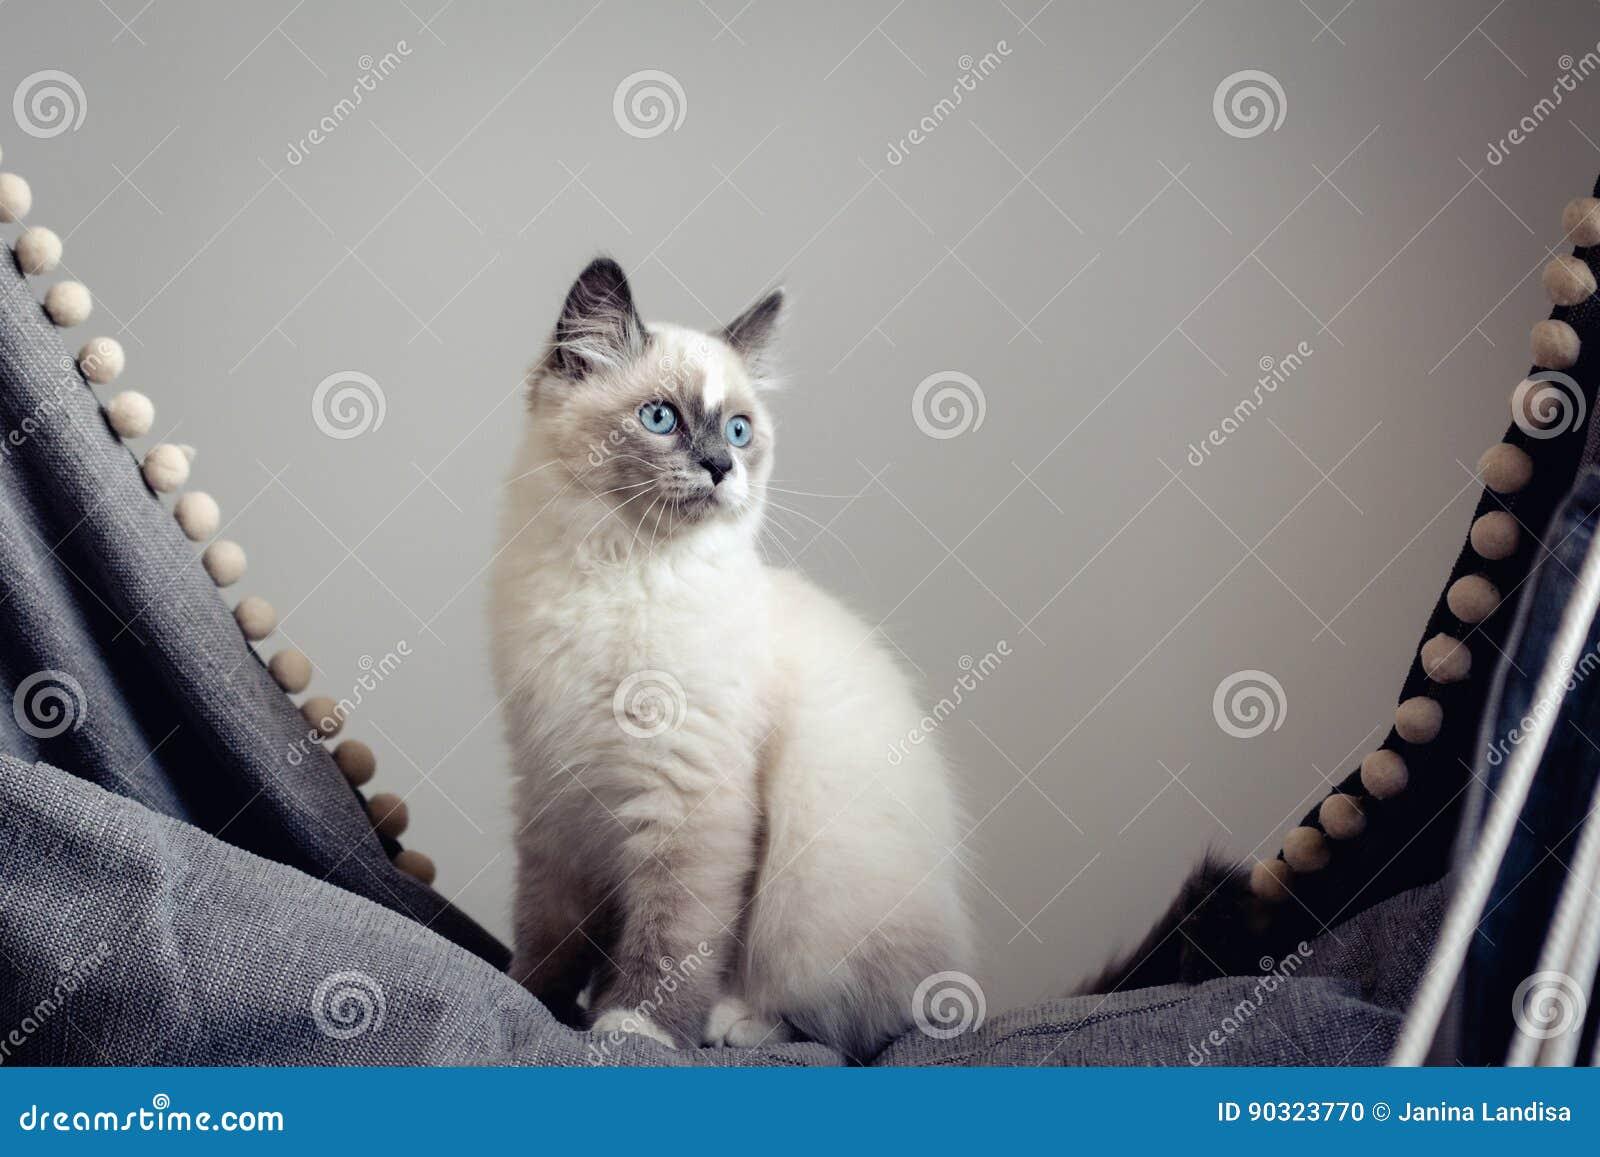 Ragdoll cat sitting